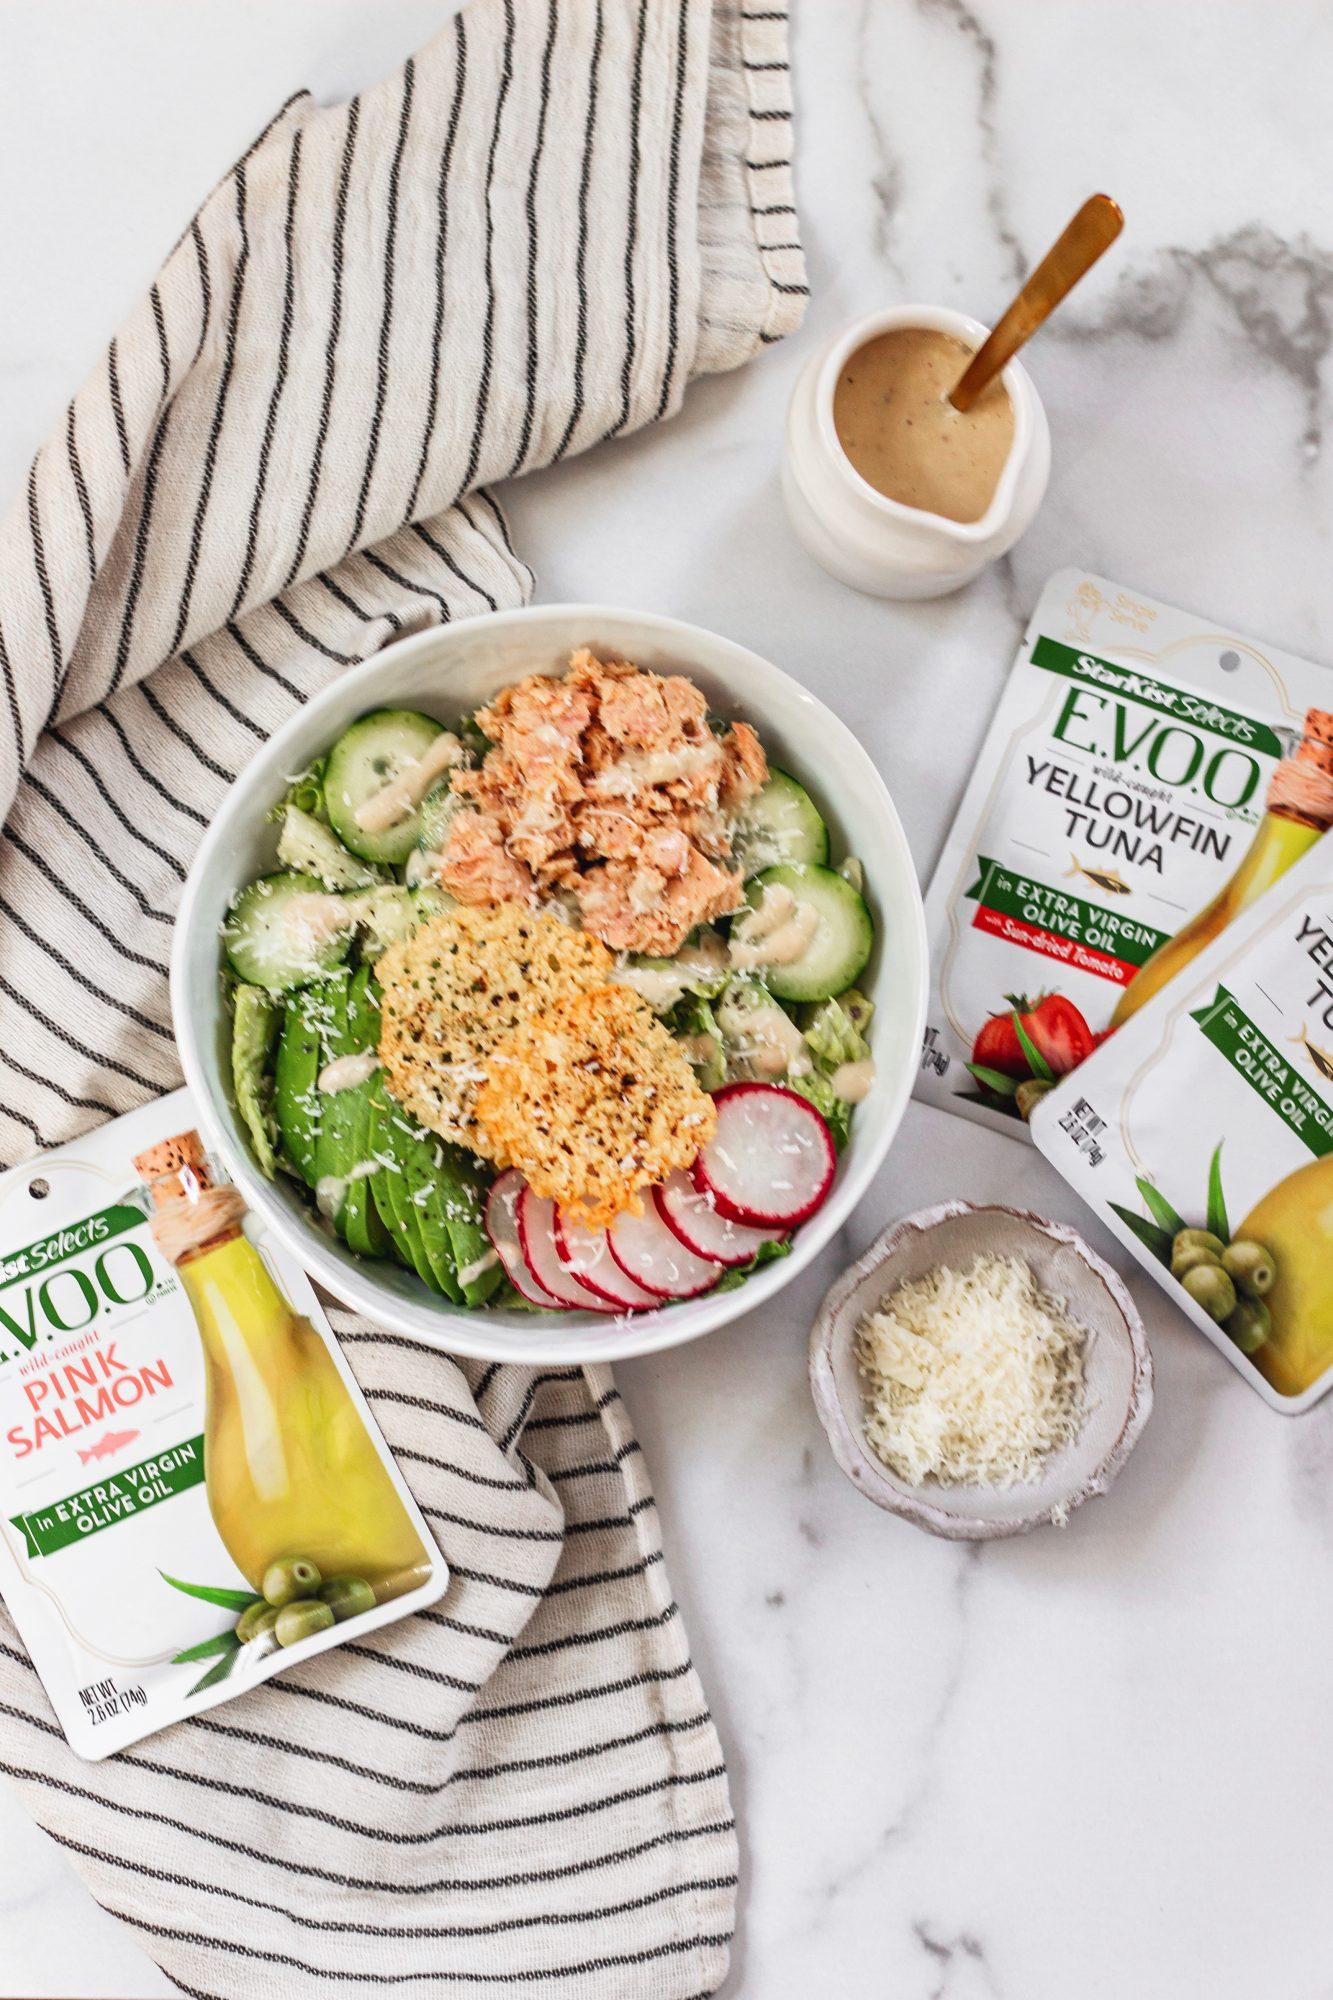 StarKist E.V.O.O Salmon makes a great Caesar salad